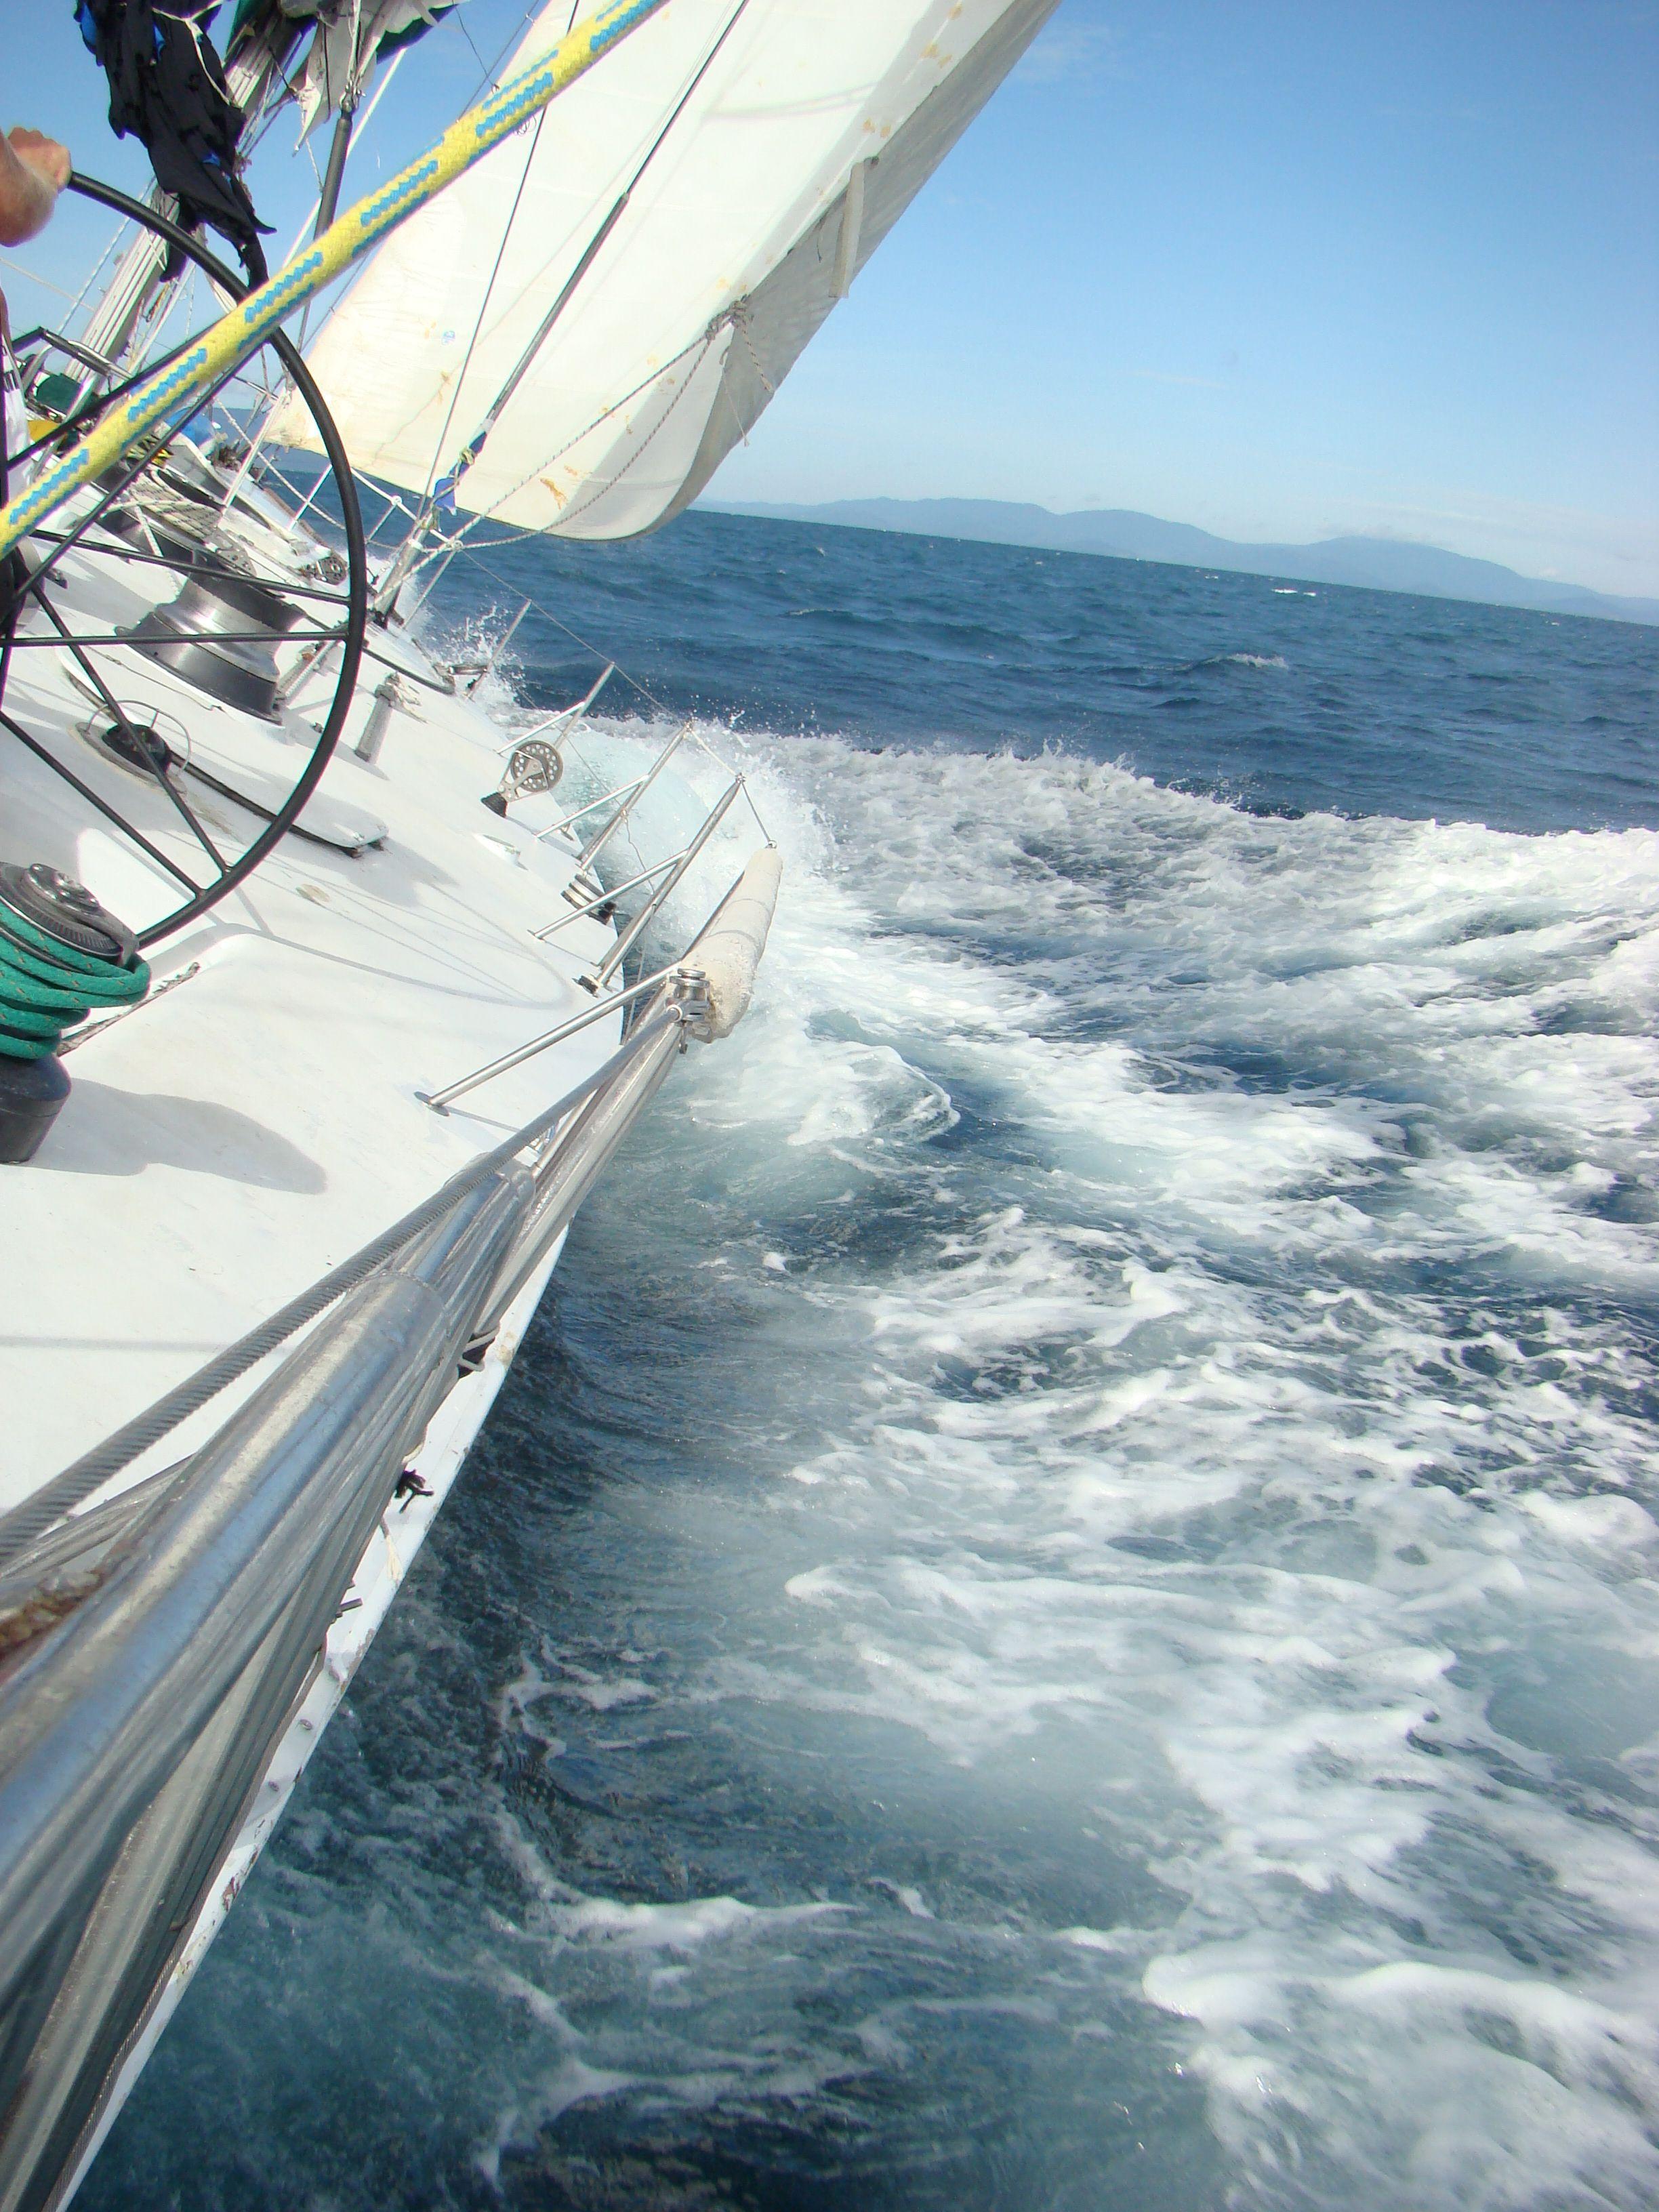 Whit Sunday Island // Australien - Segeltörn